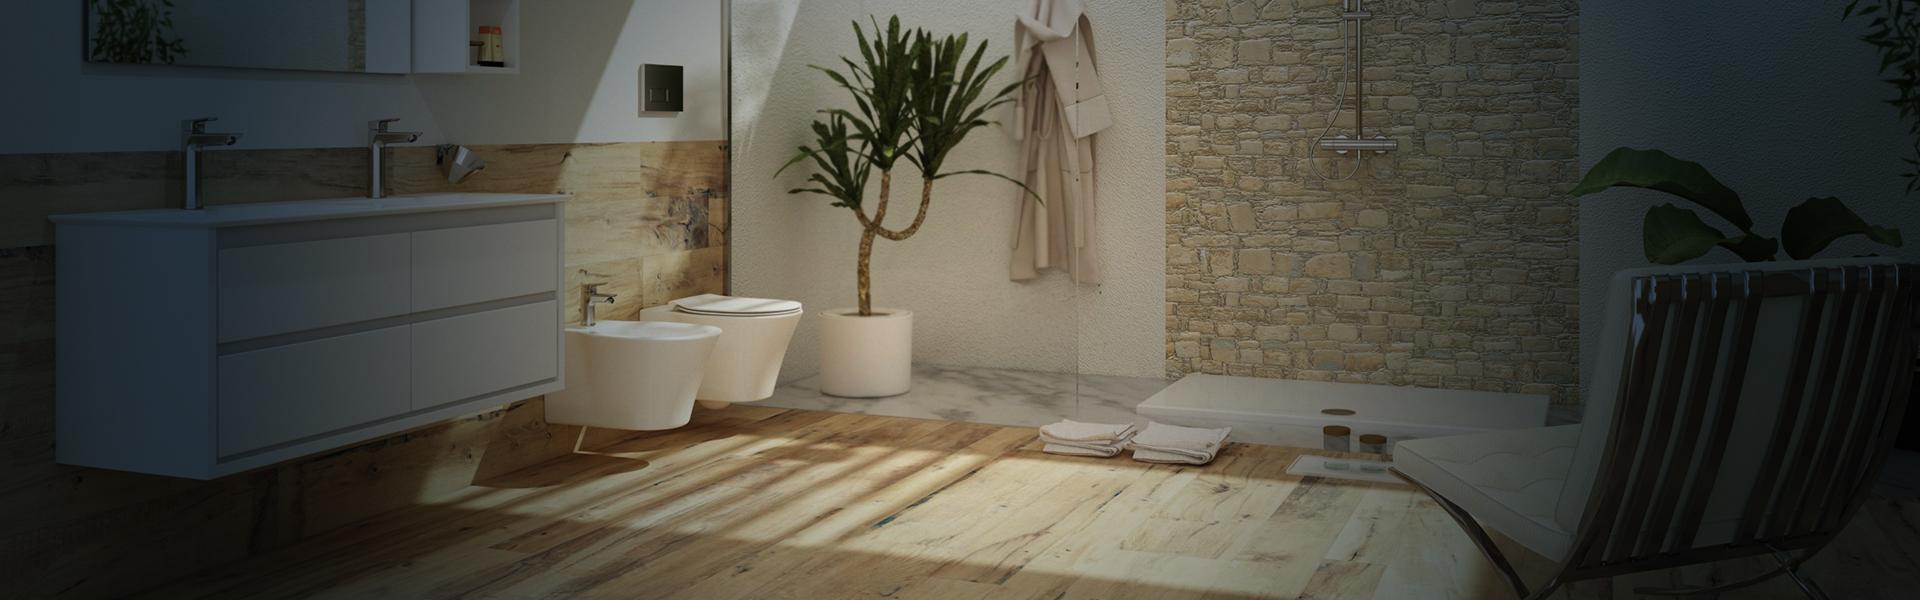 Interni on line gratis best fabulous progetto di bagno - Planner bagno 3d ...